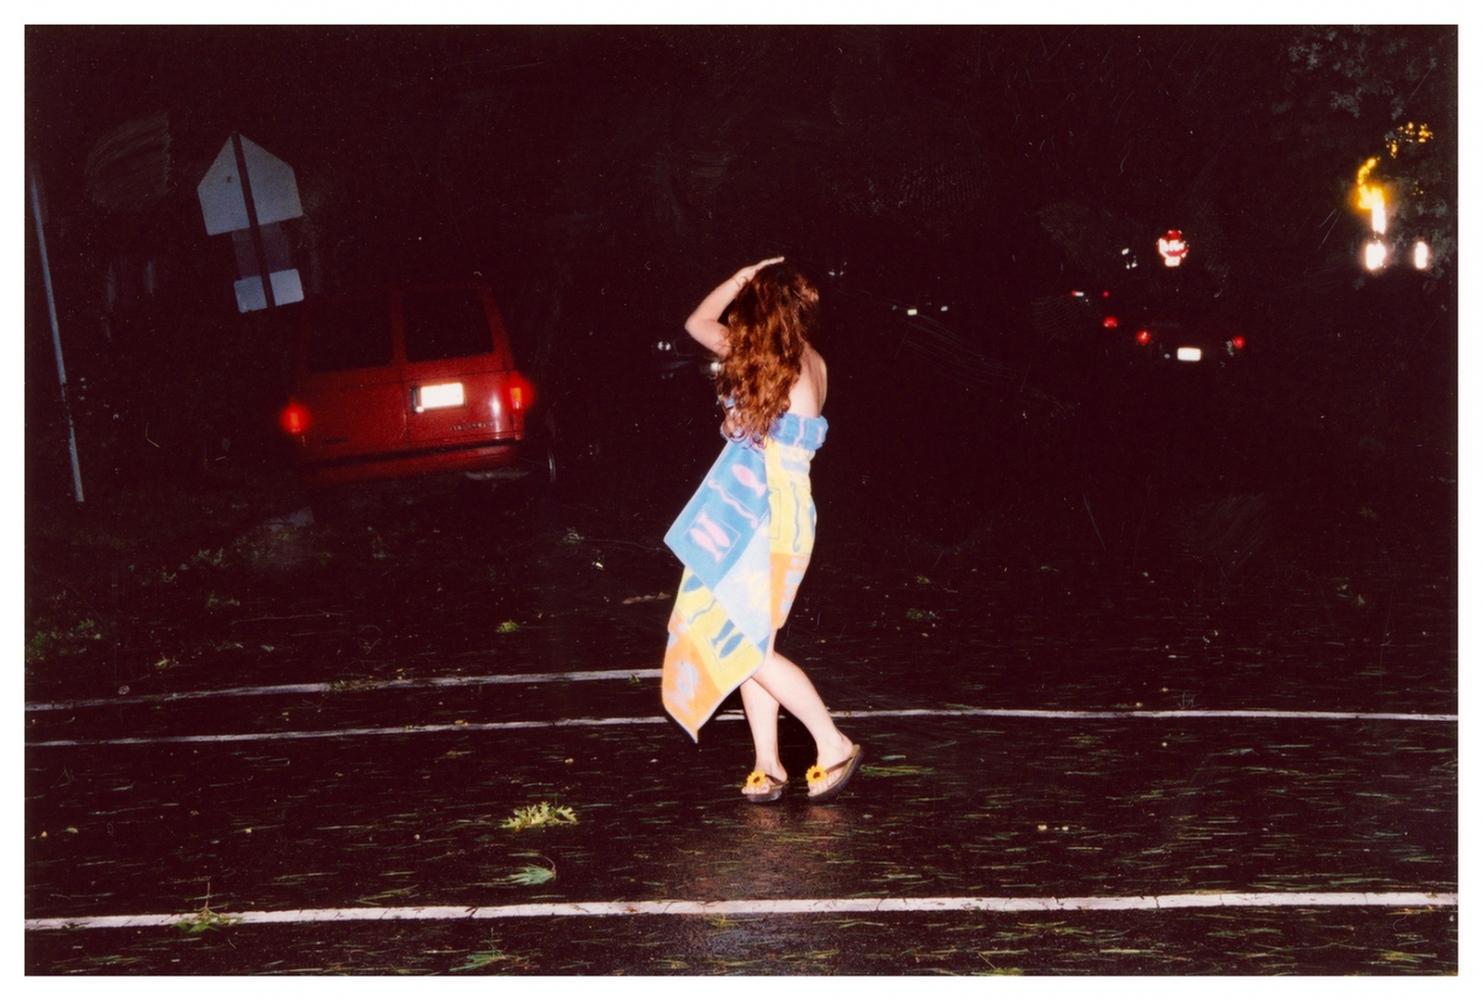 If You Must Walk, Walk Silently / Hannah, 2004